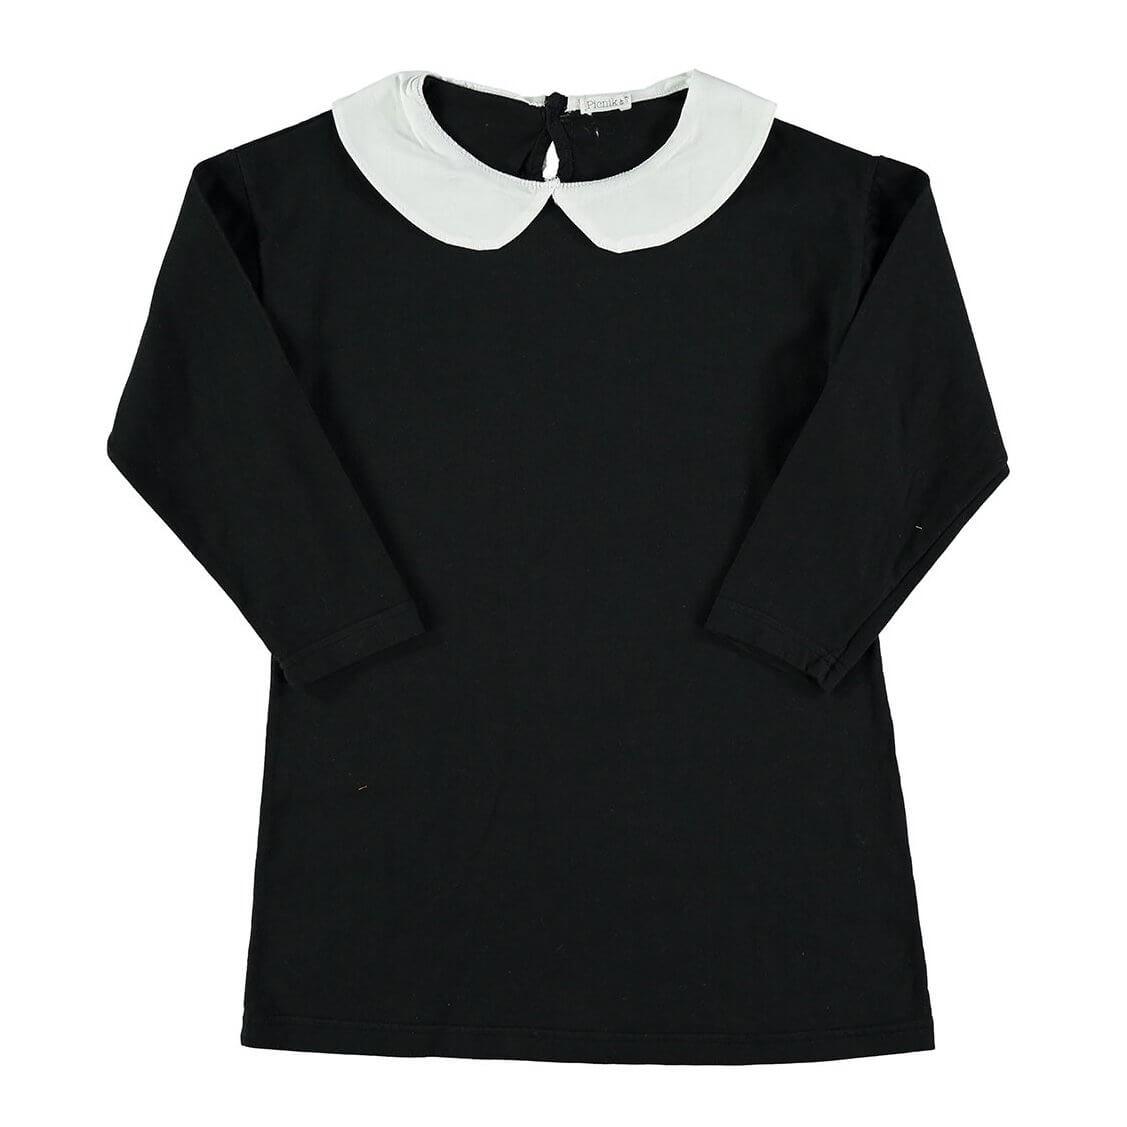 PICNIK BARCELONA T-shirtkleid, schwarz